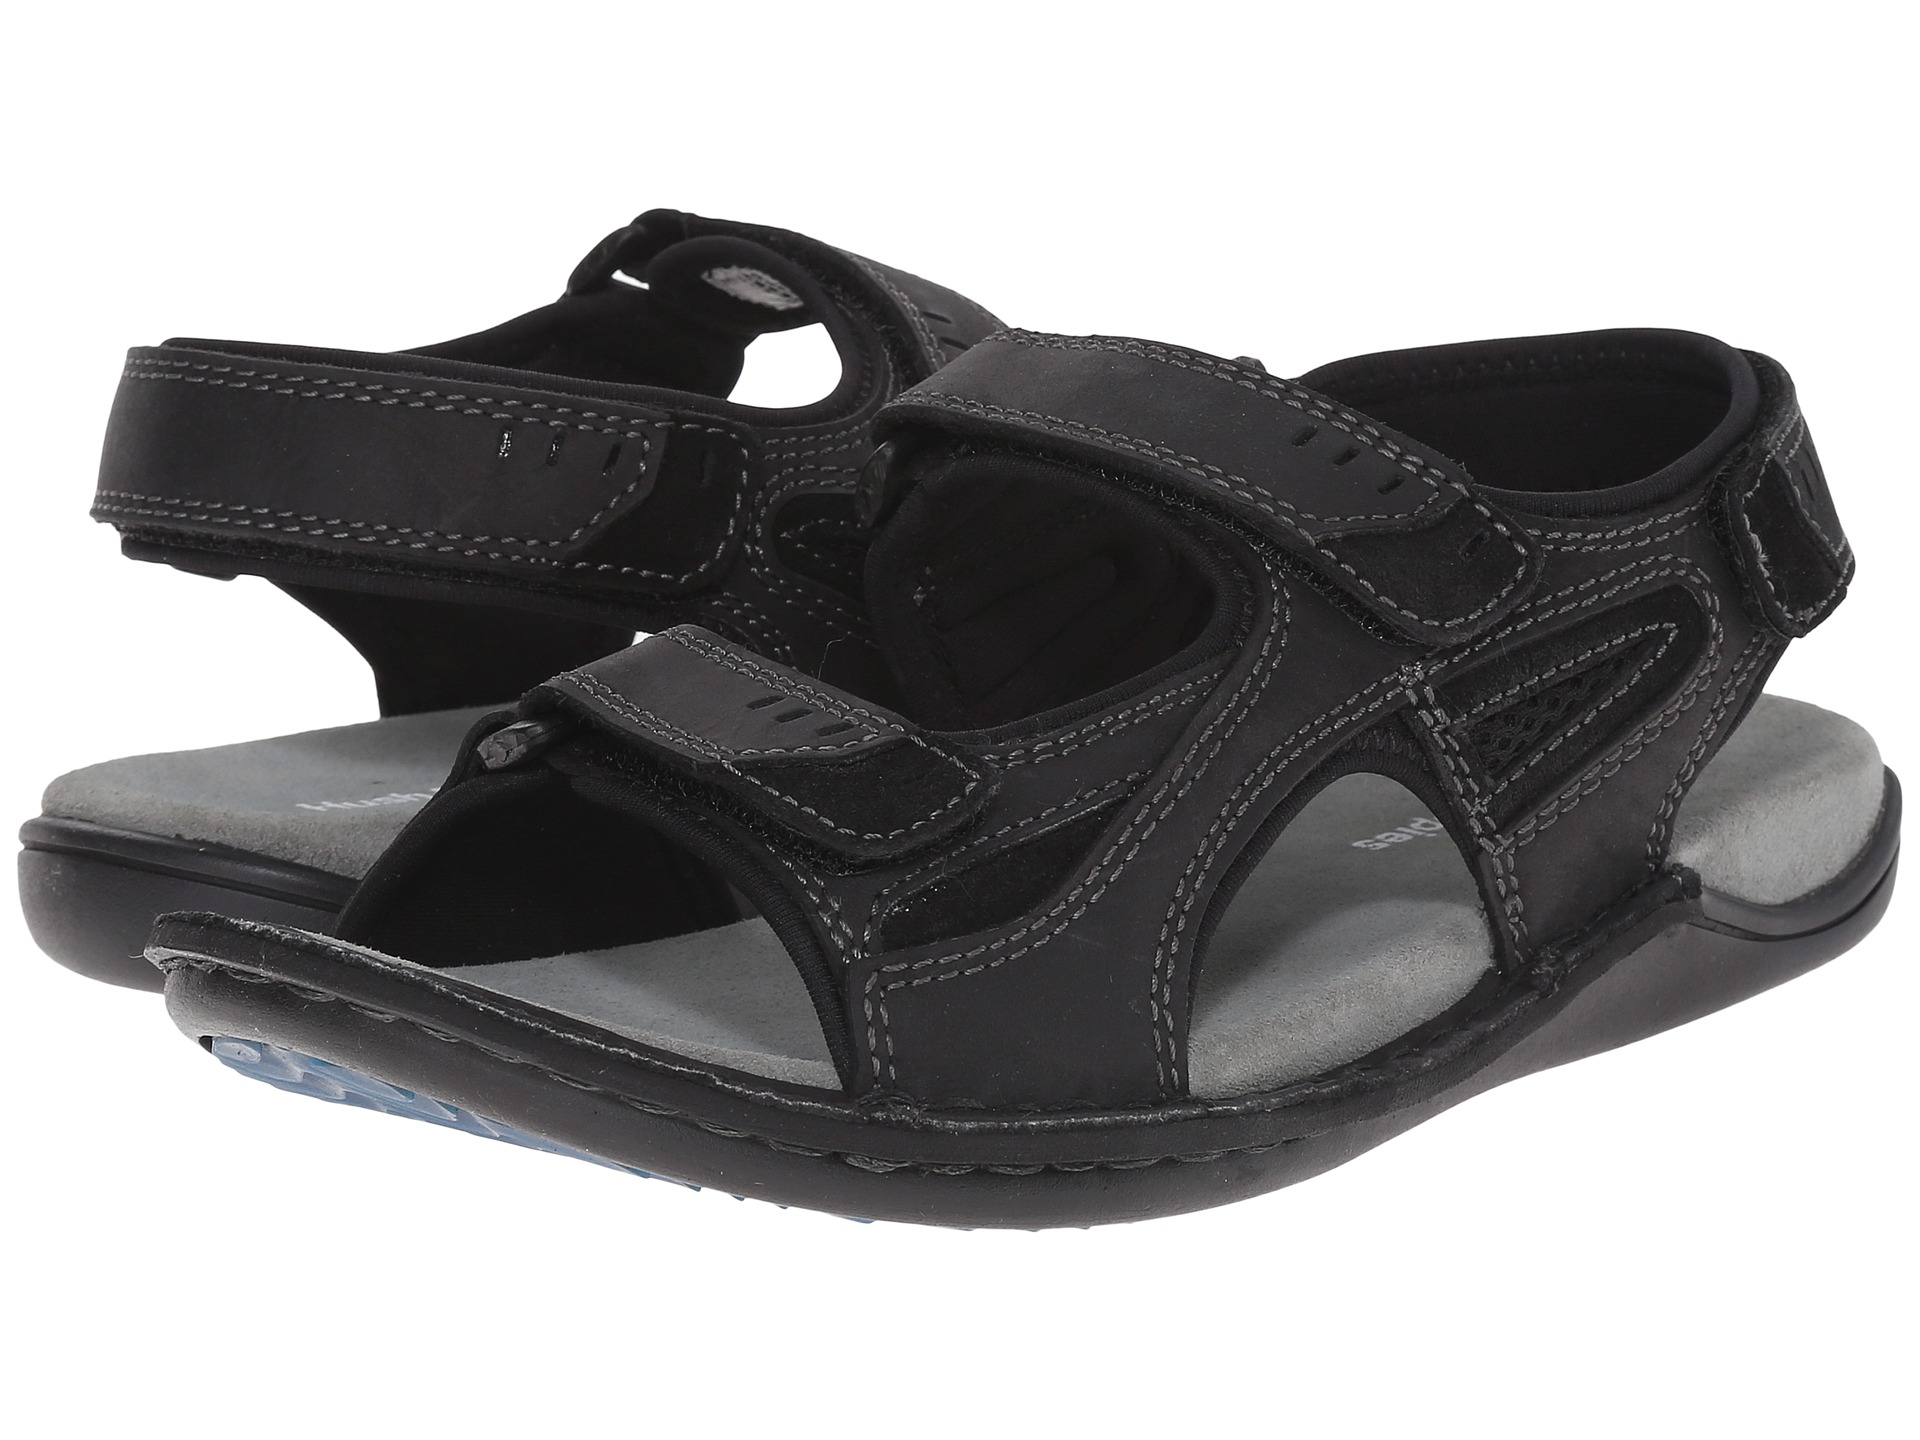 Black sandals size 11 - View More Like This Hush Puppies Rawson Grady